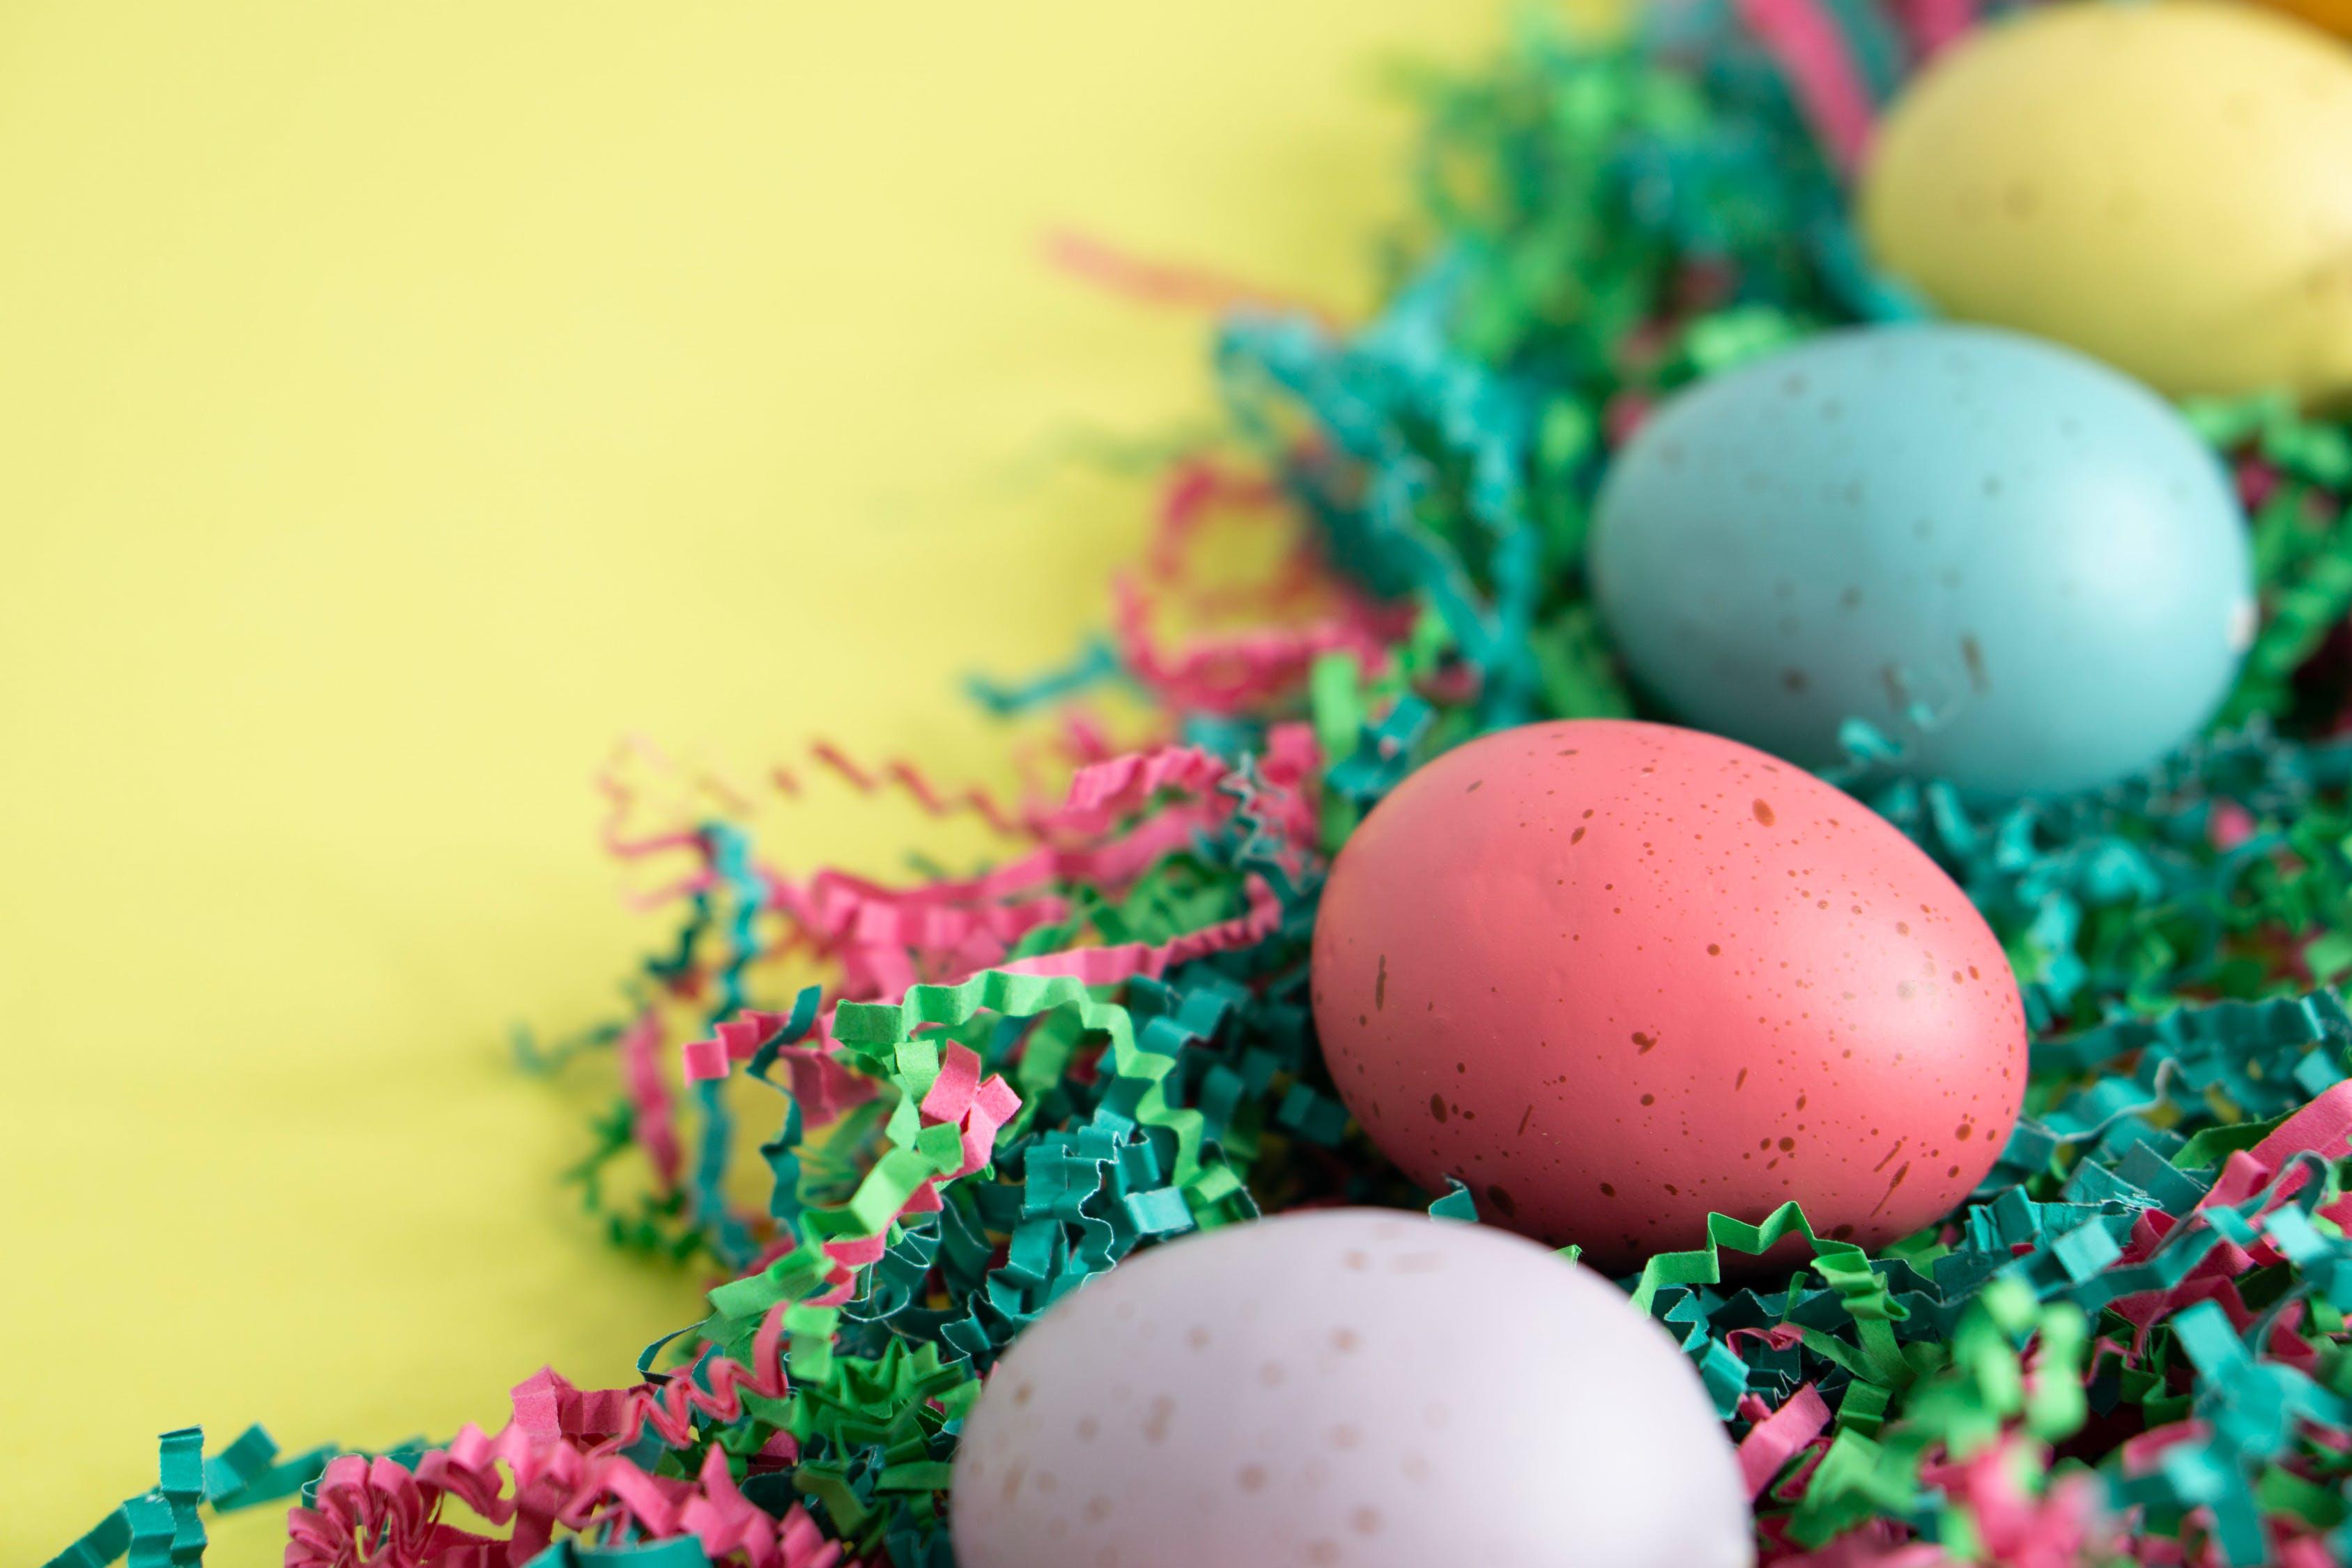 復活節彩蛋 Easter Egg